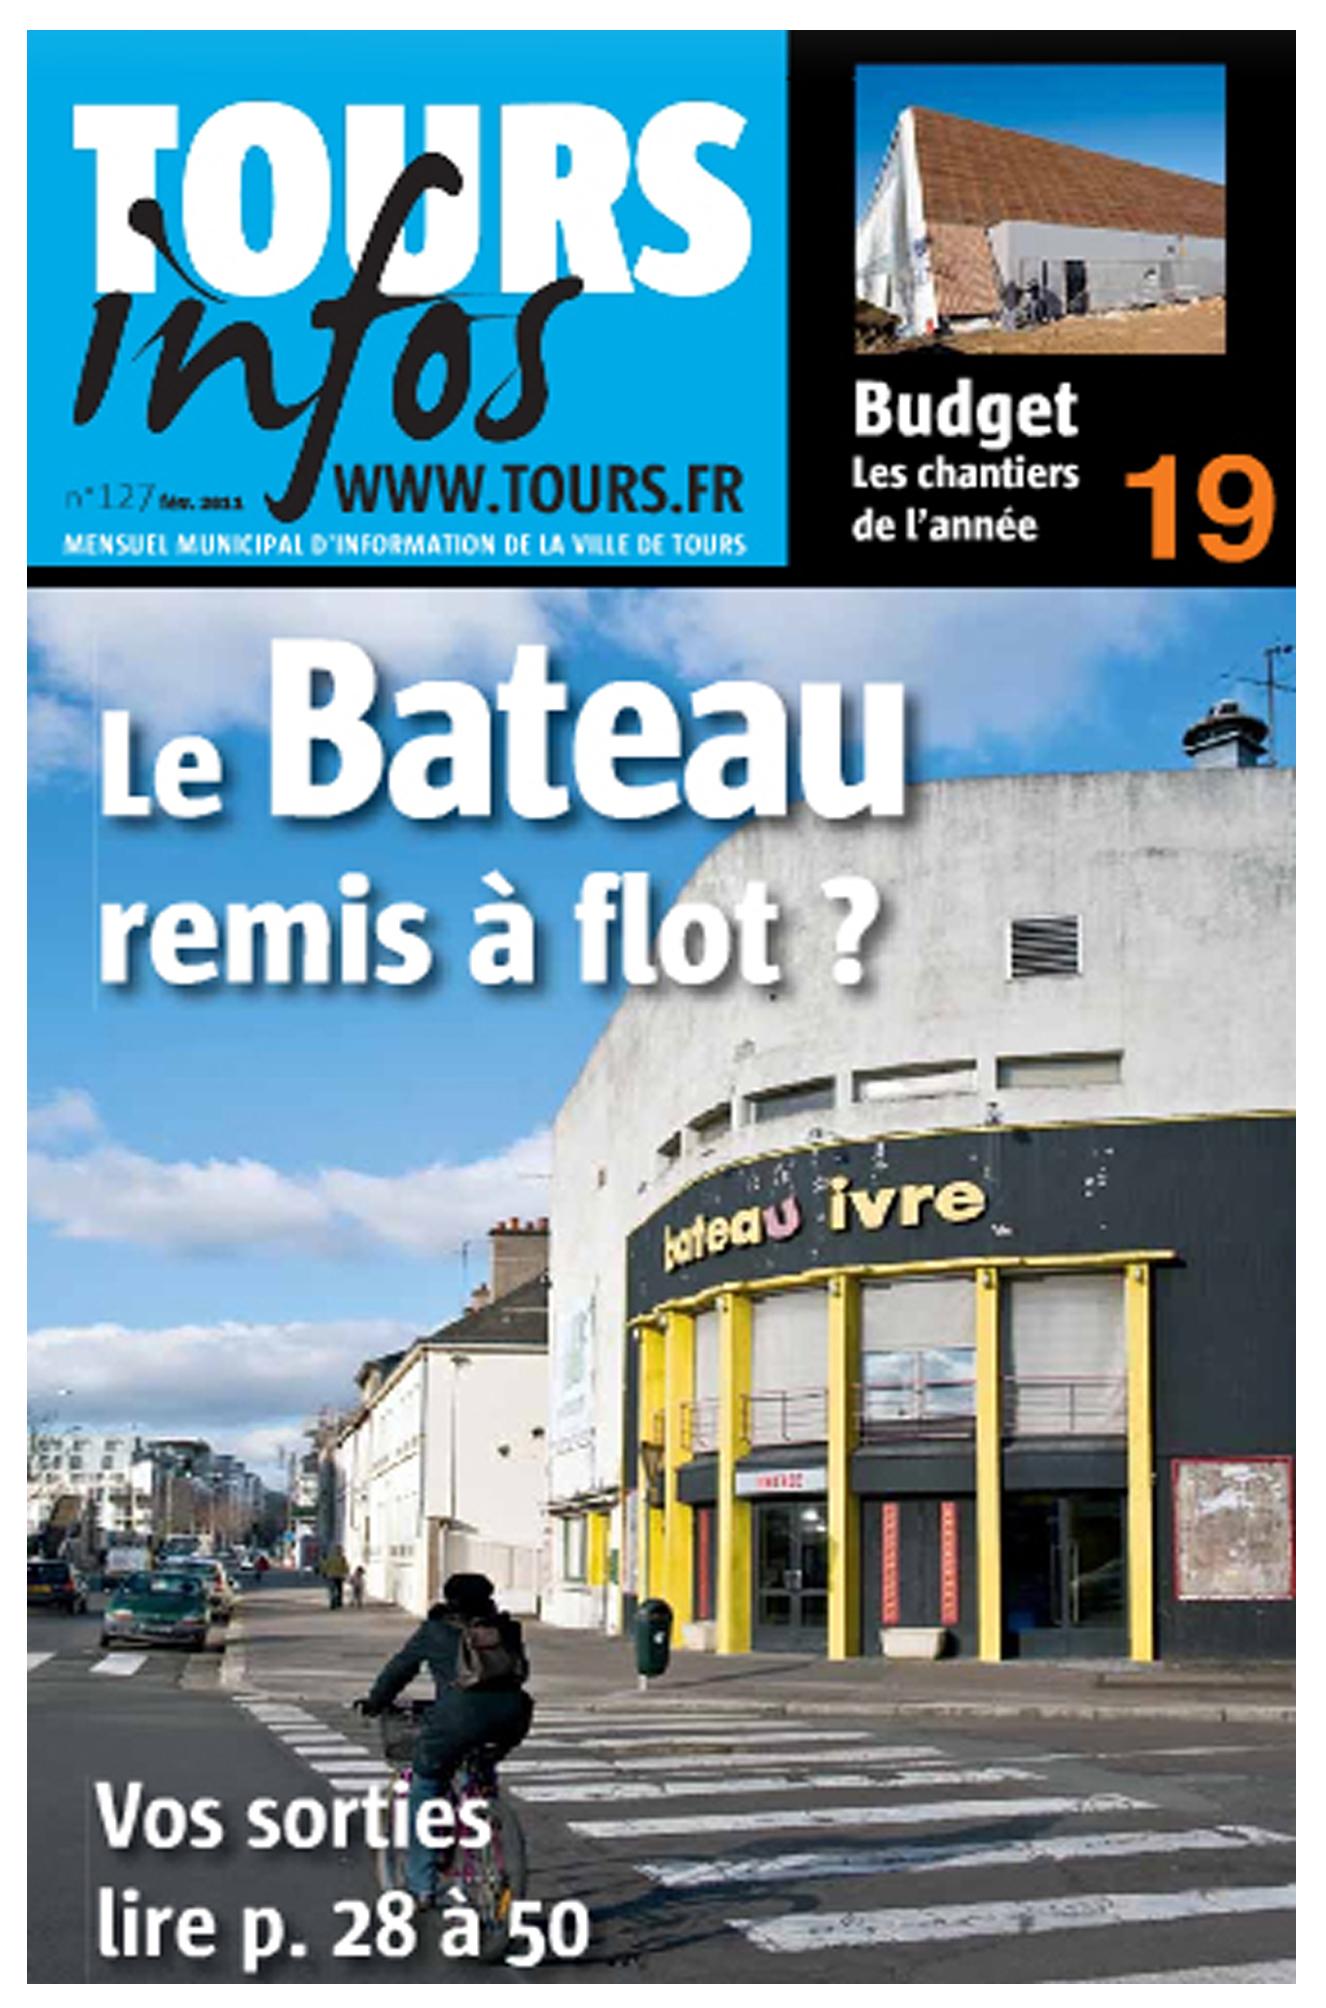 tours-infos-08-02-2011